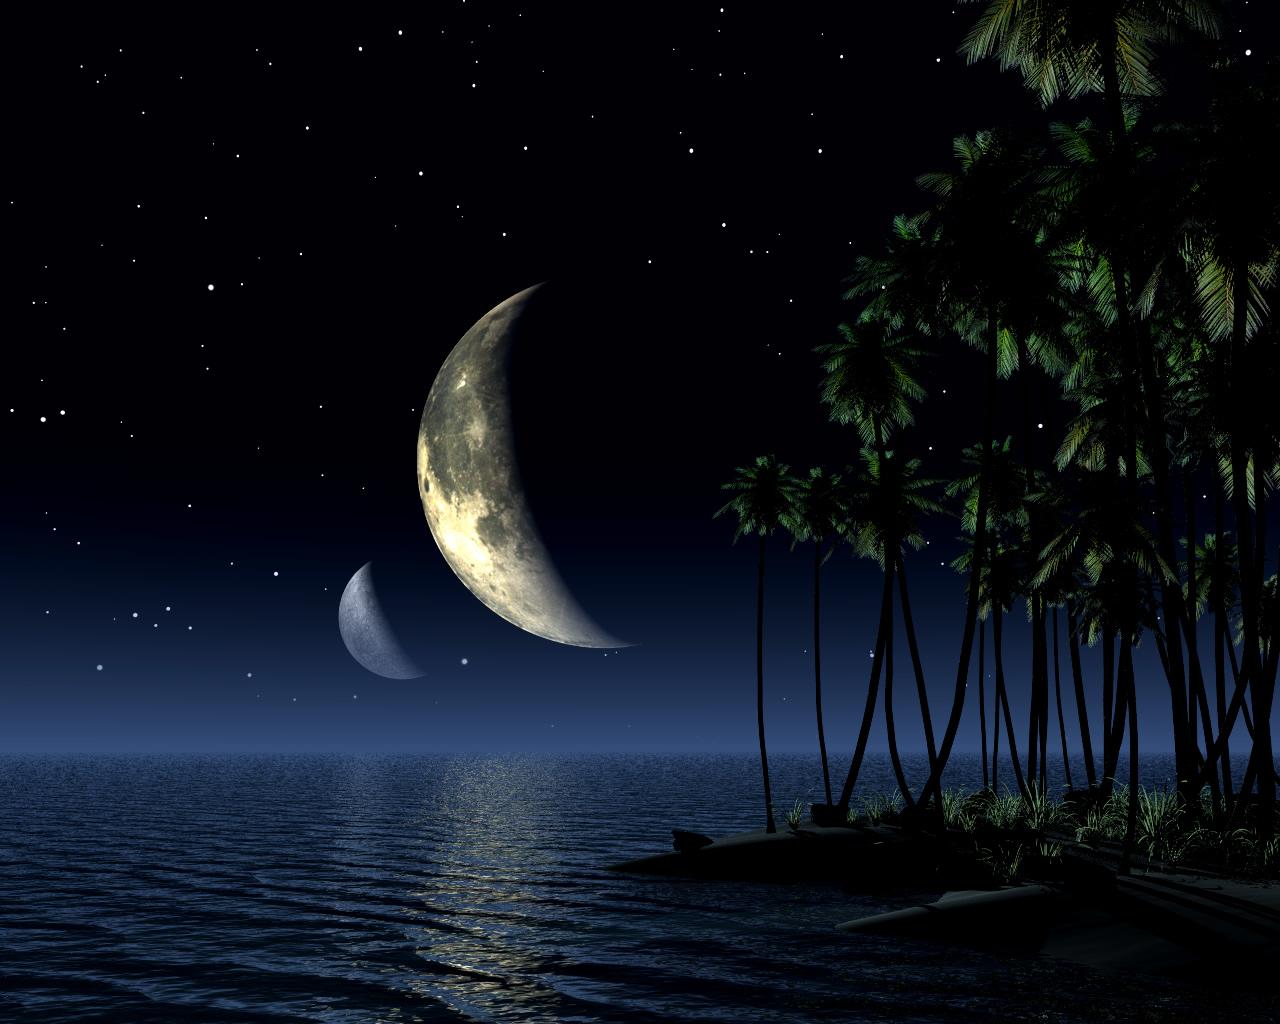 3d moon at night wallpaper 3d flying horse wallpaper 3d forrest ...